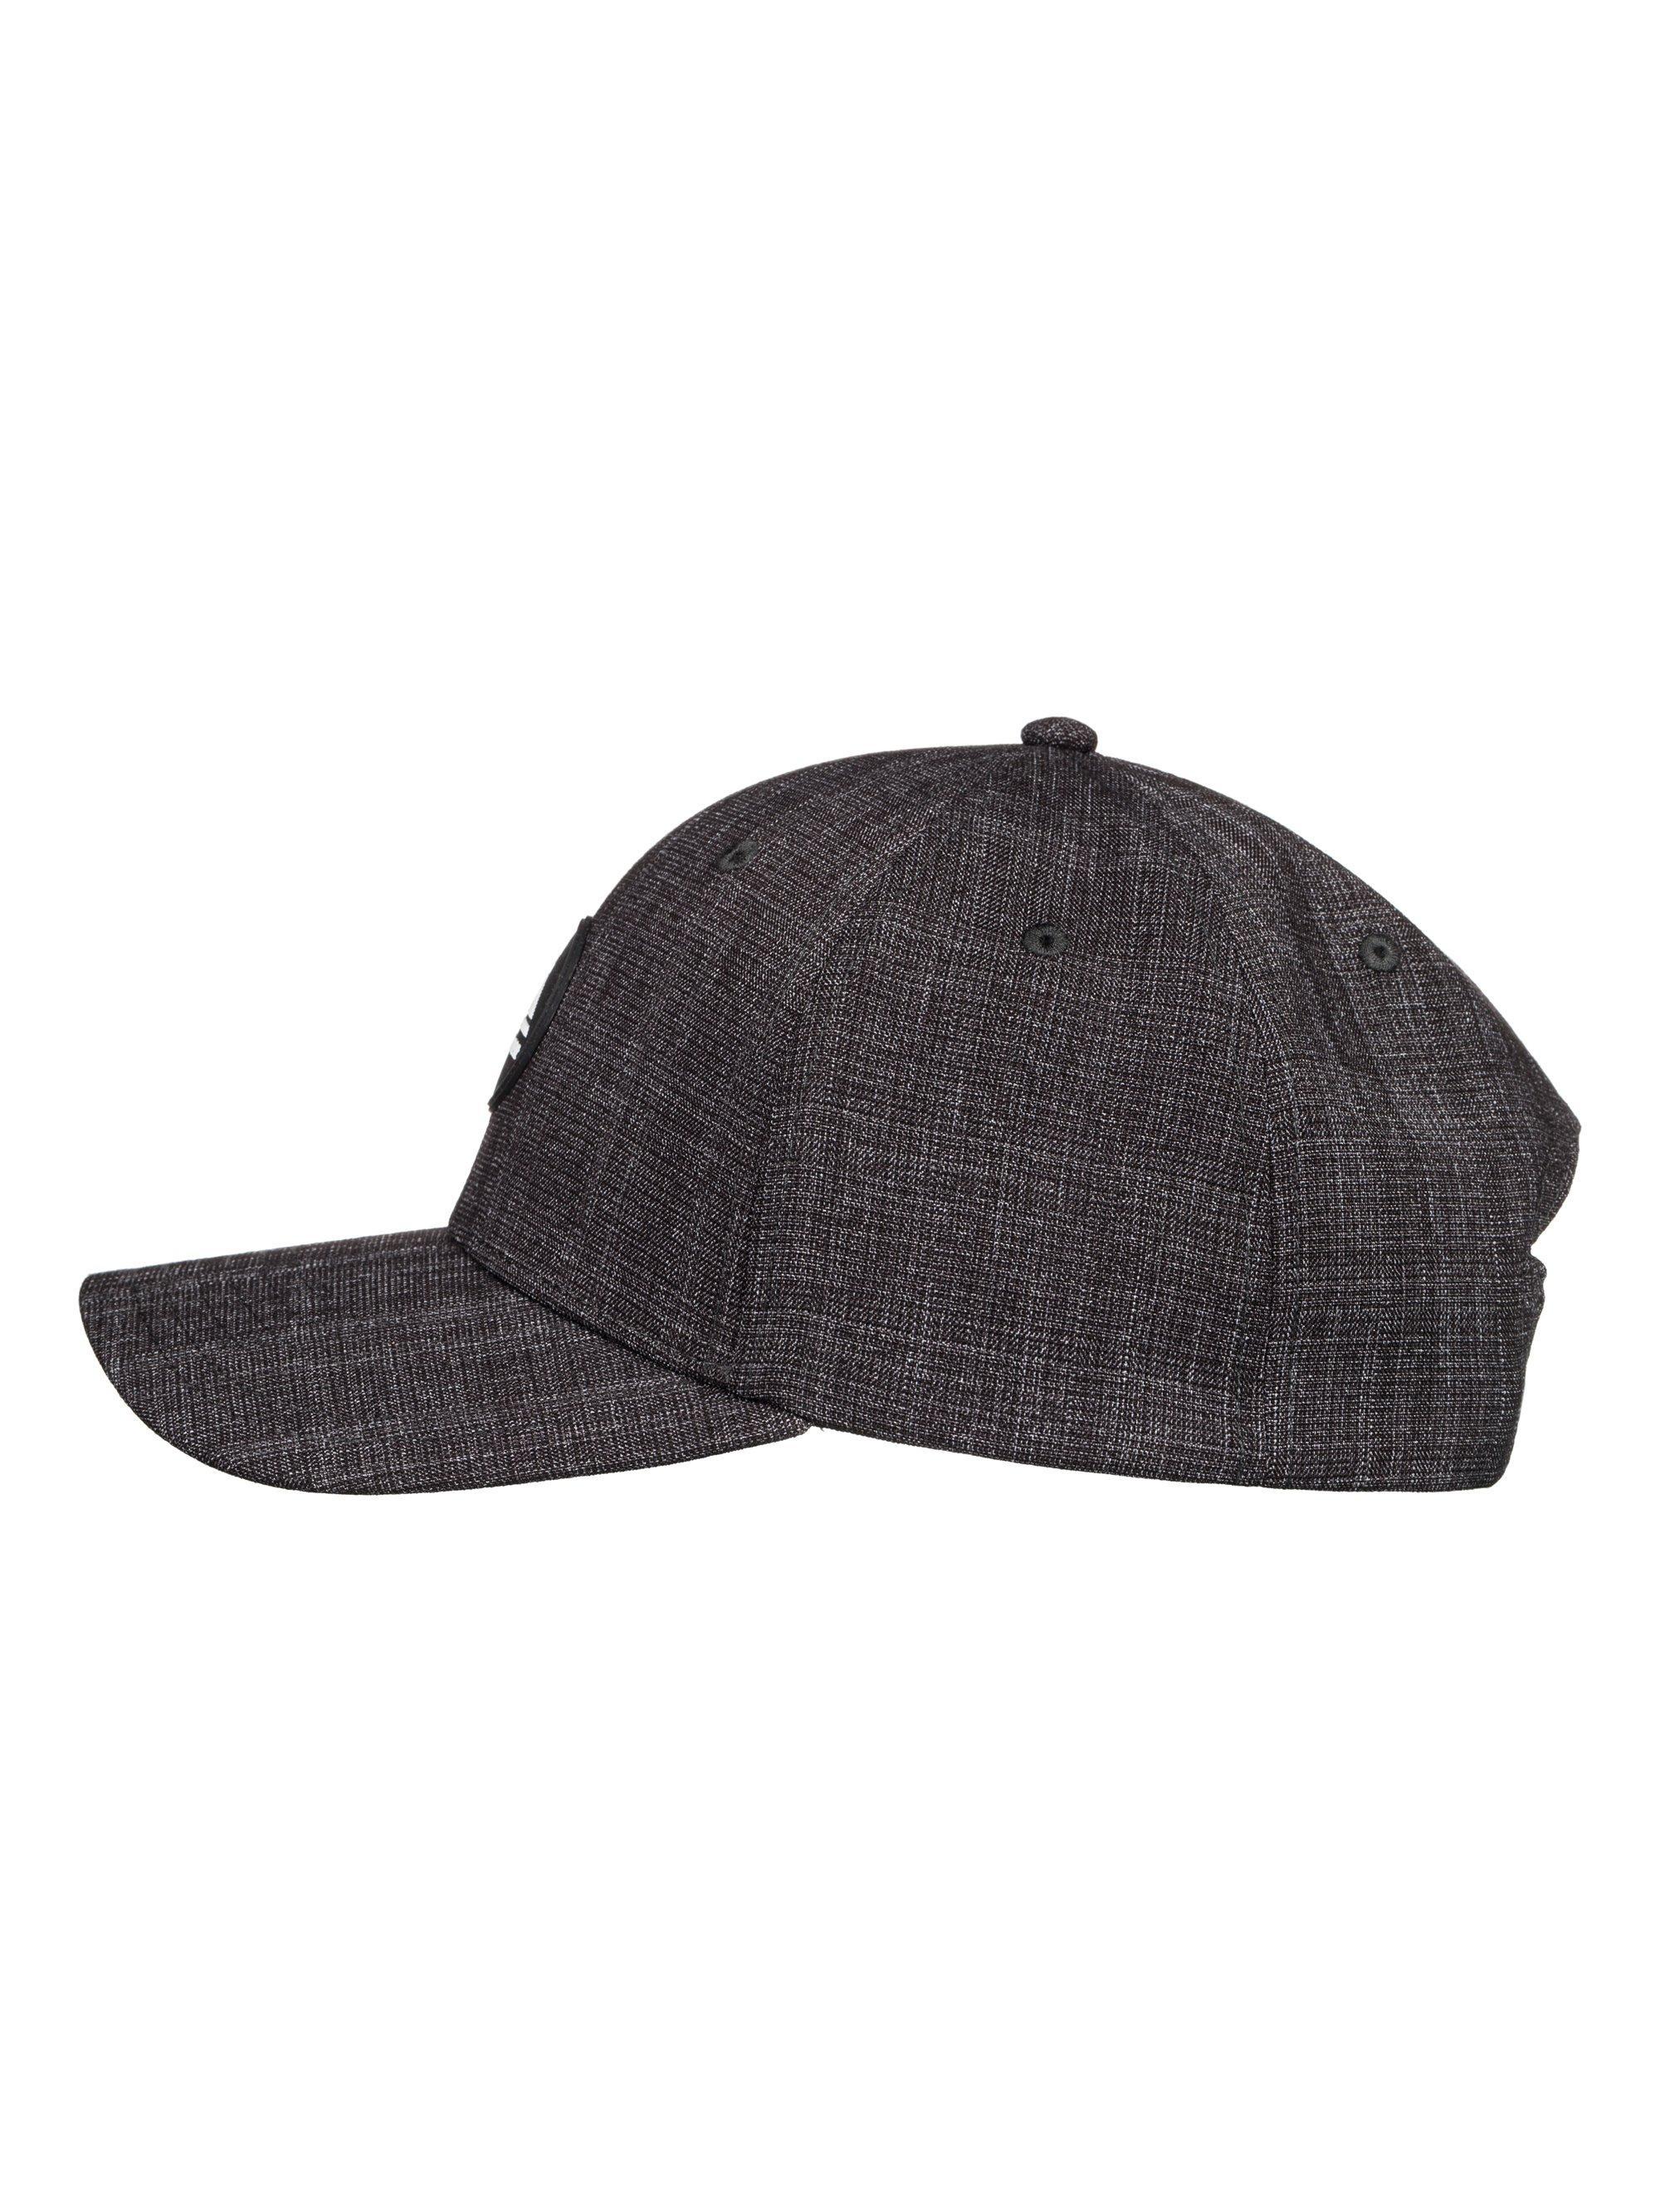 Super Unleaded Hat, Dark Gray,Pewter,Slate, swatch